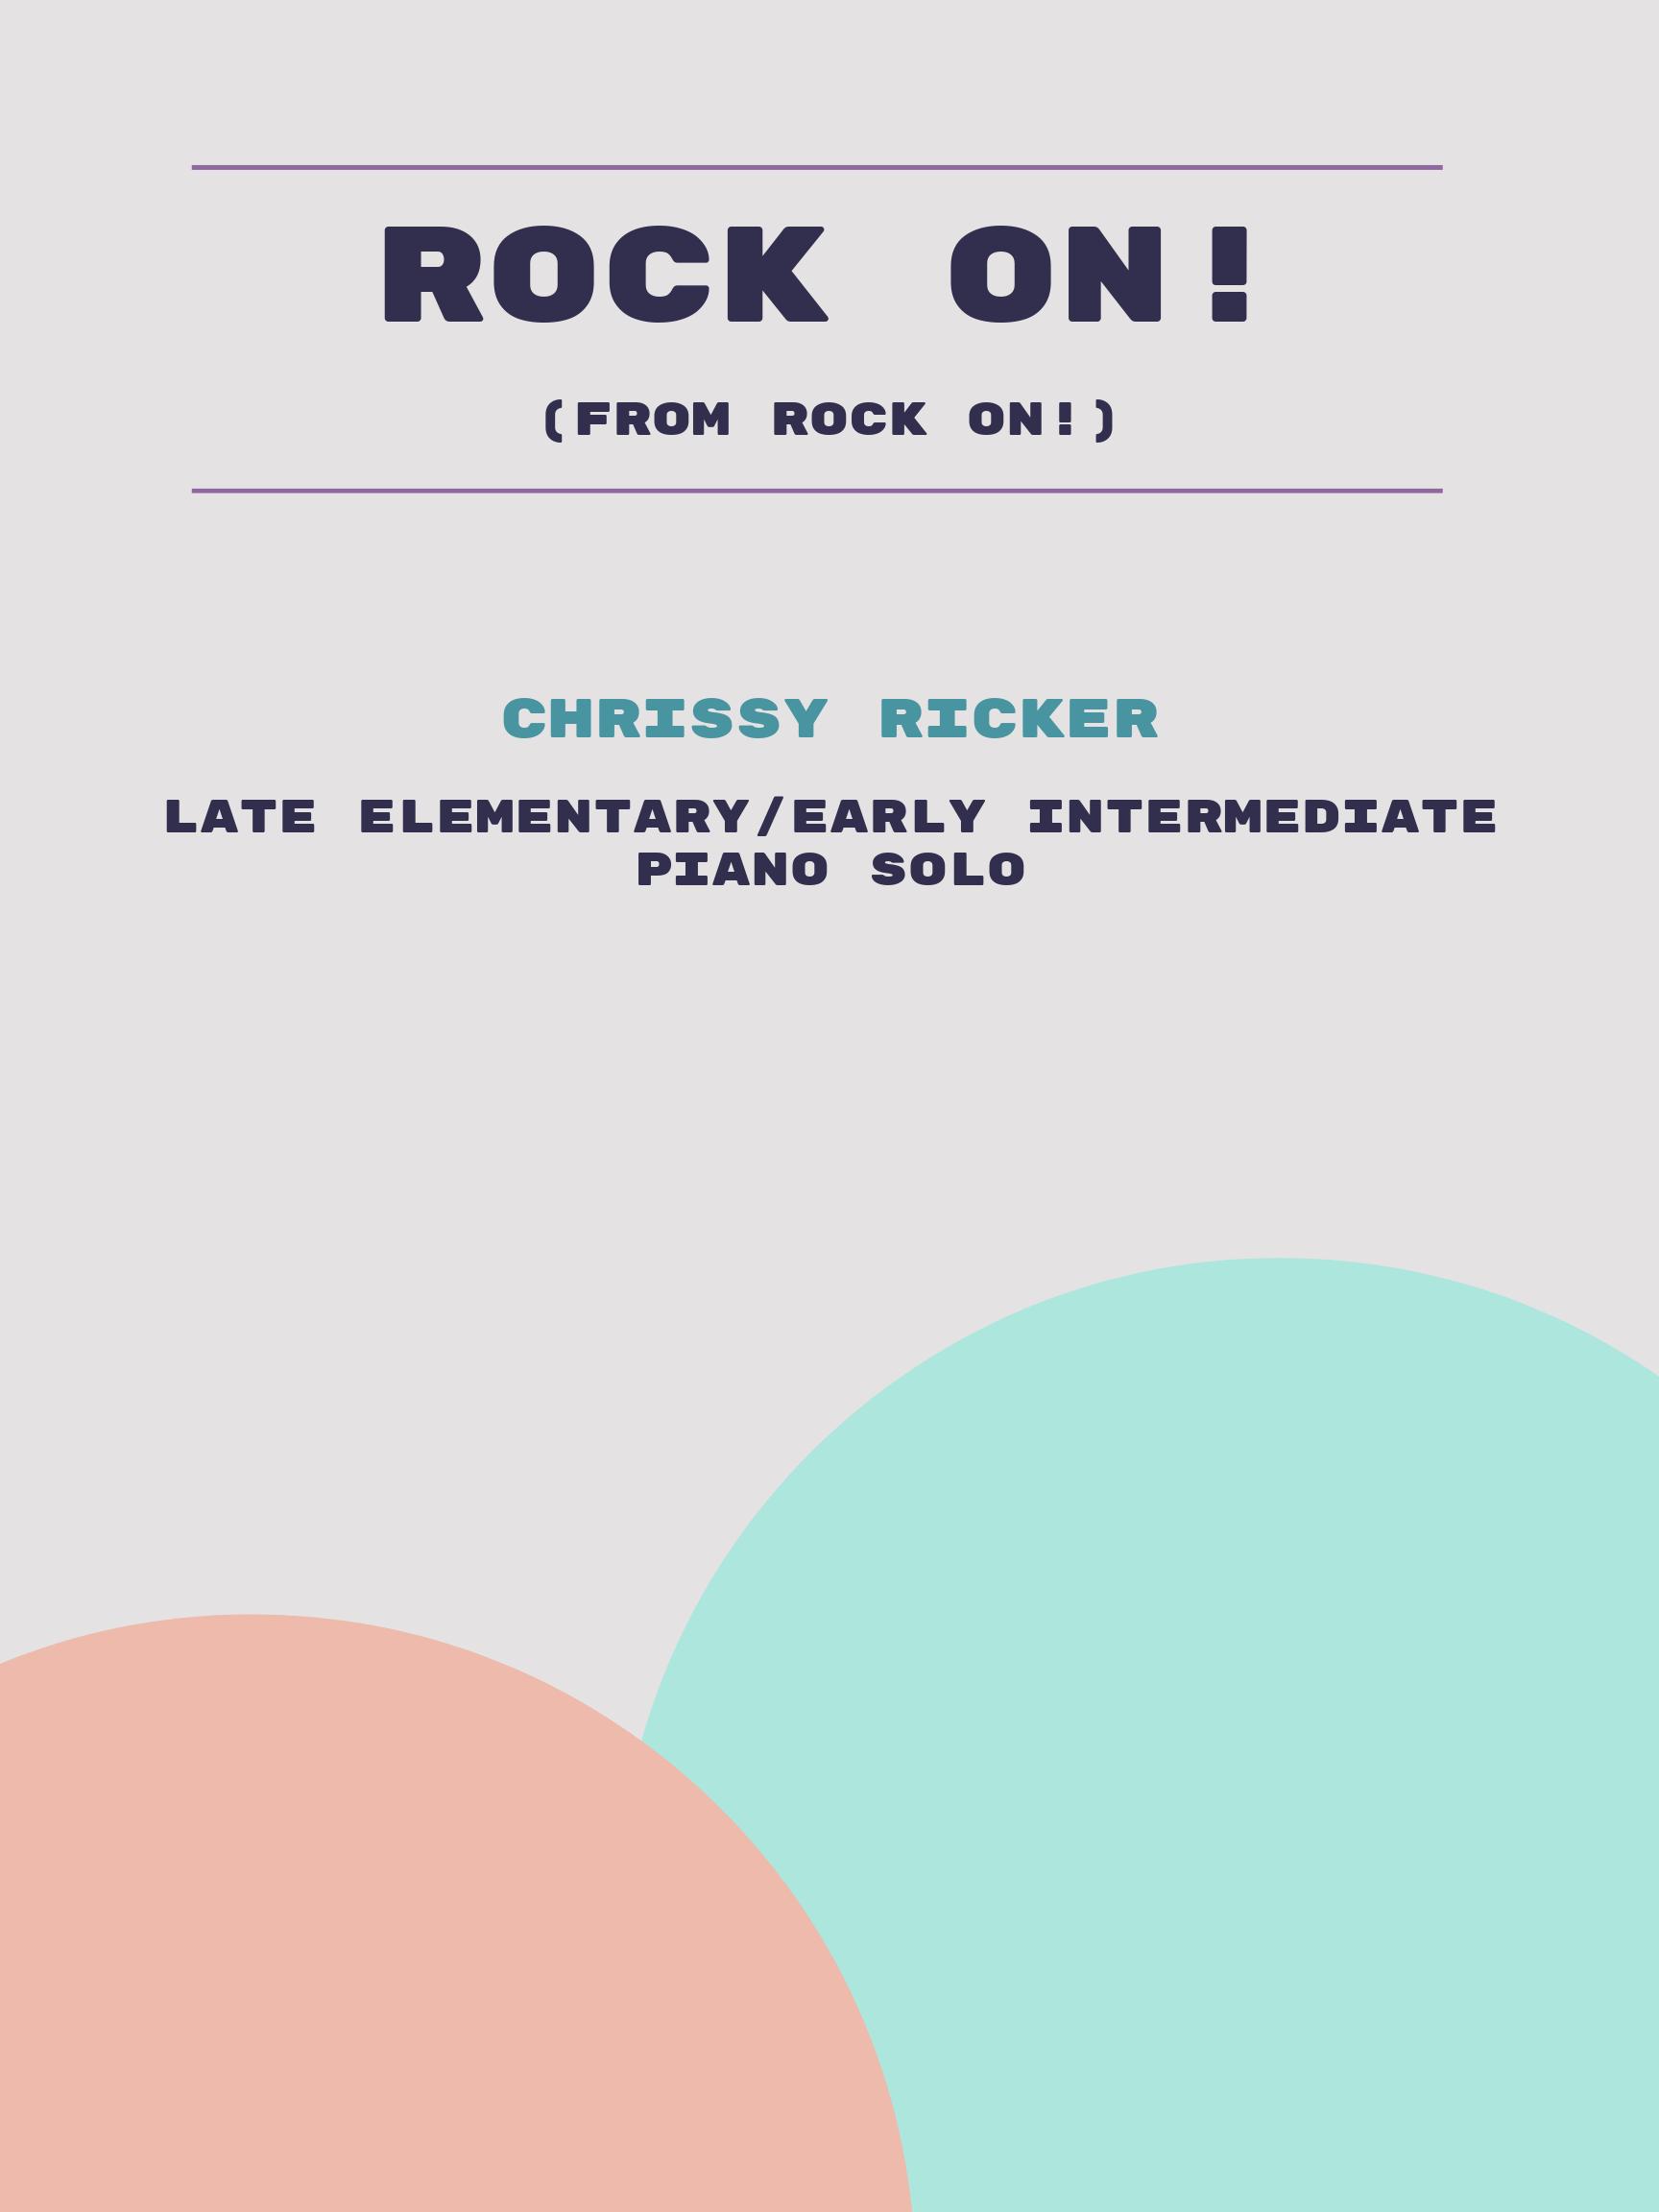 Rock On! by Chrissy Ricker